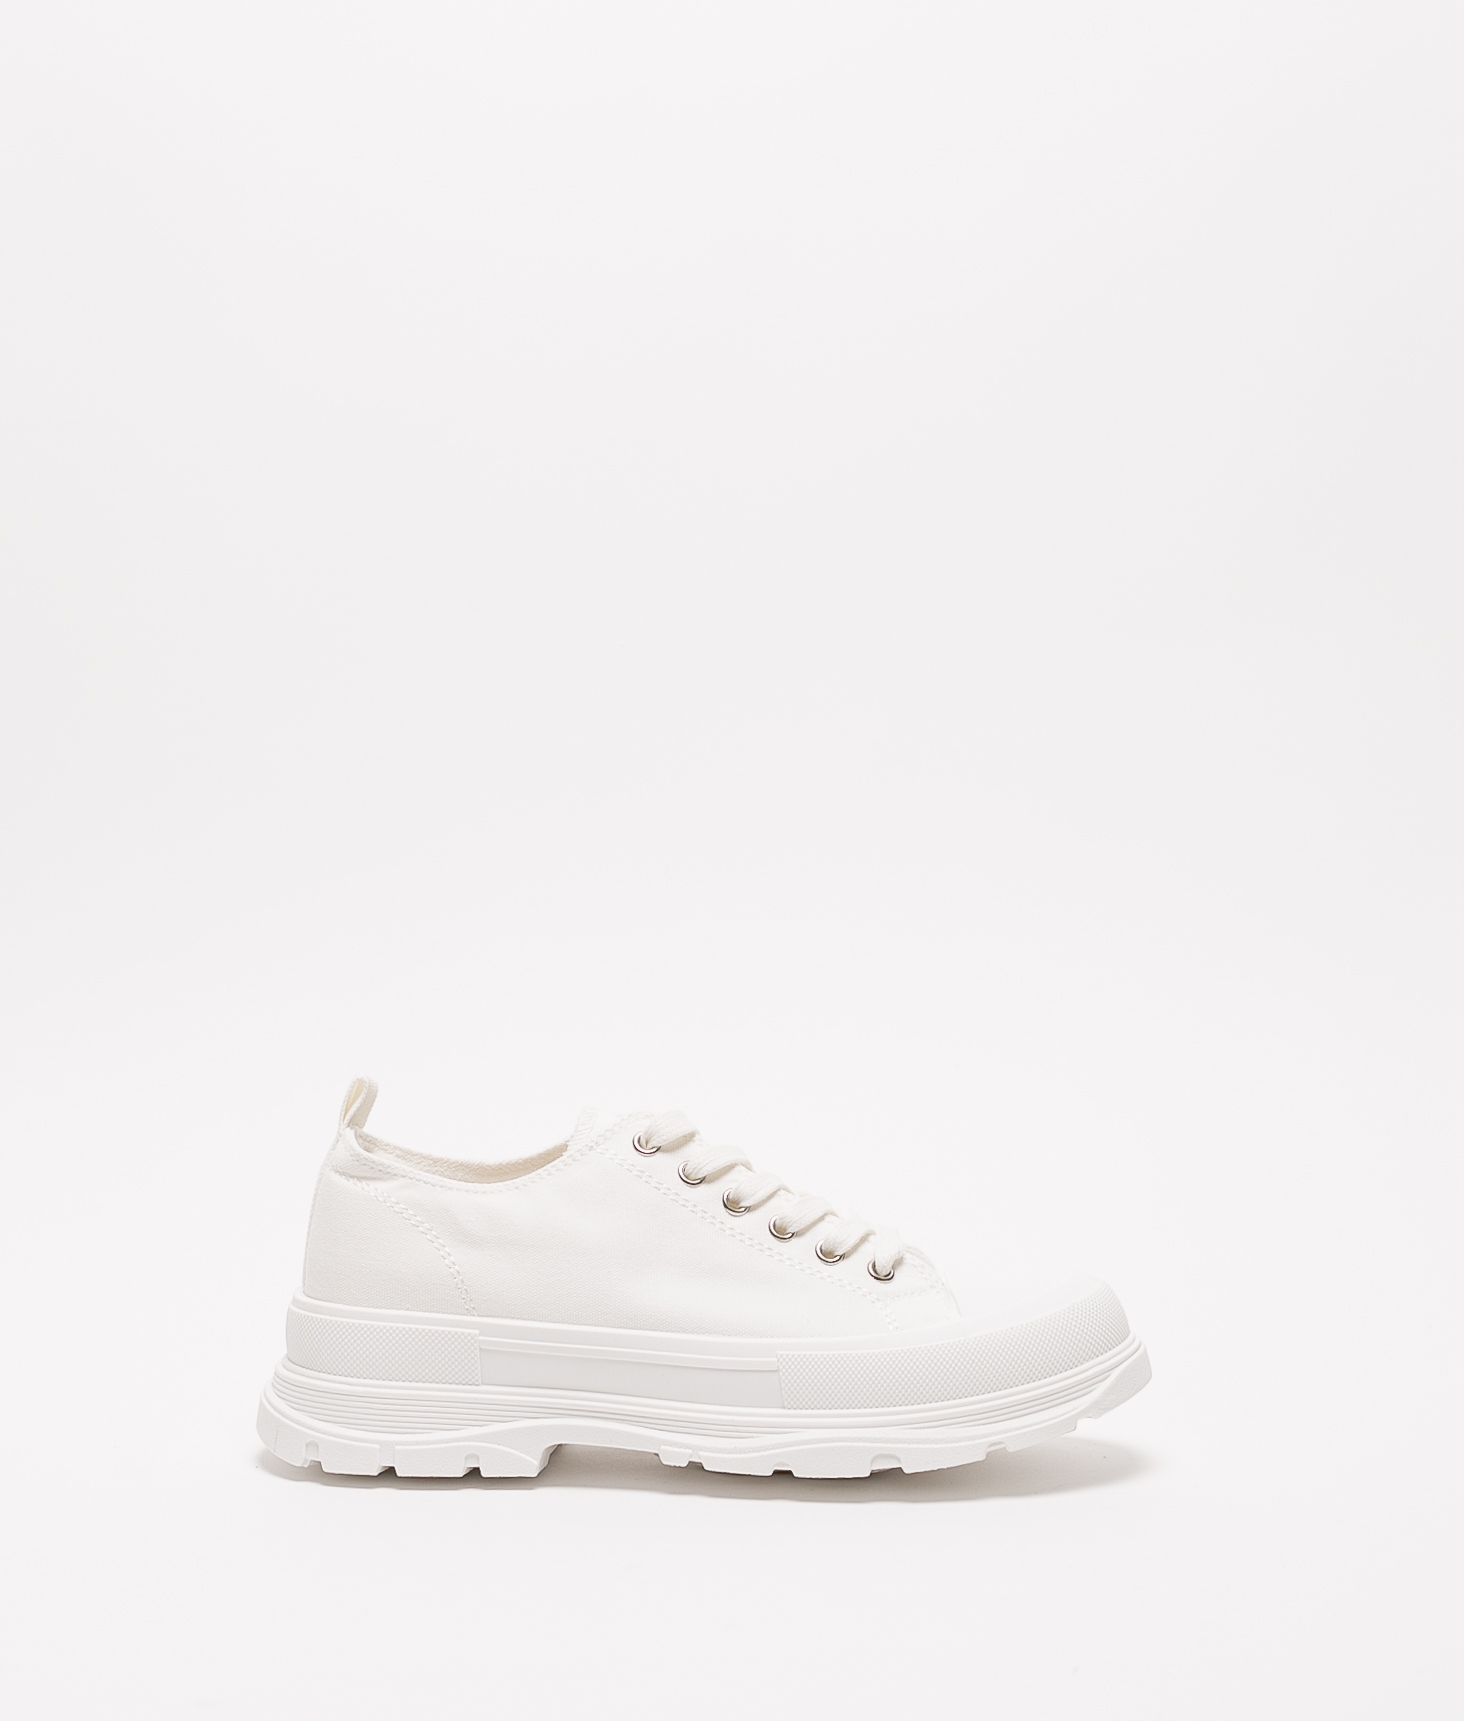 Sneakers Kele - Bianco